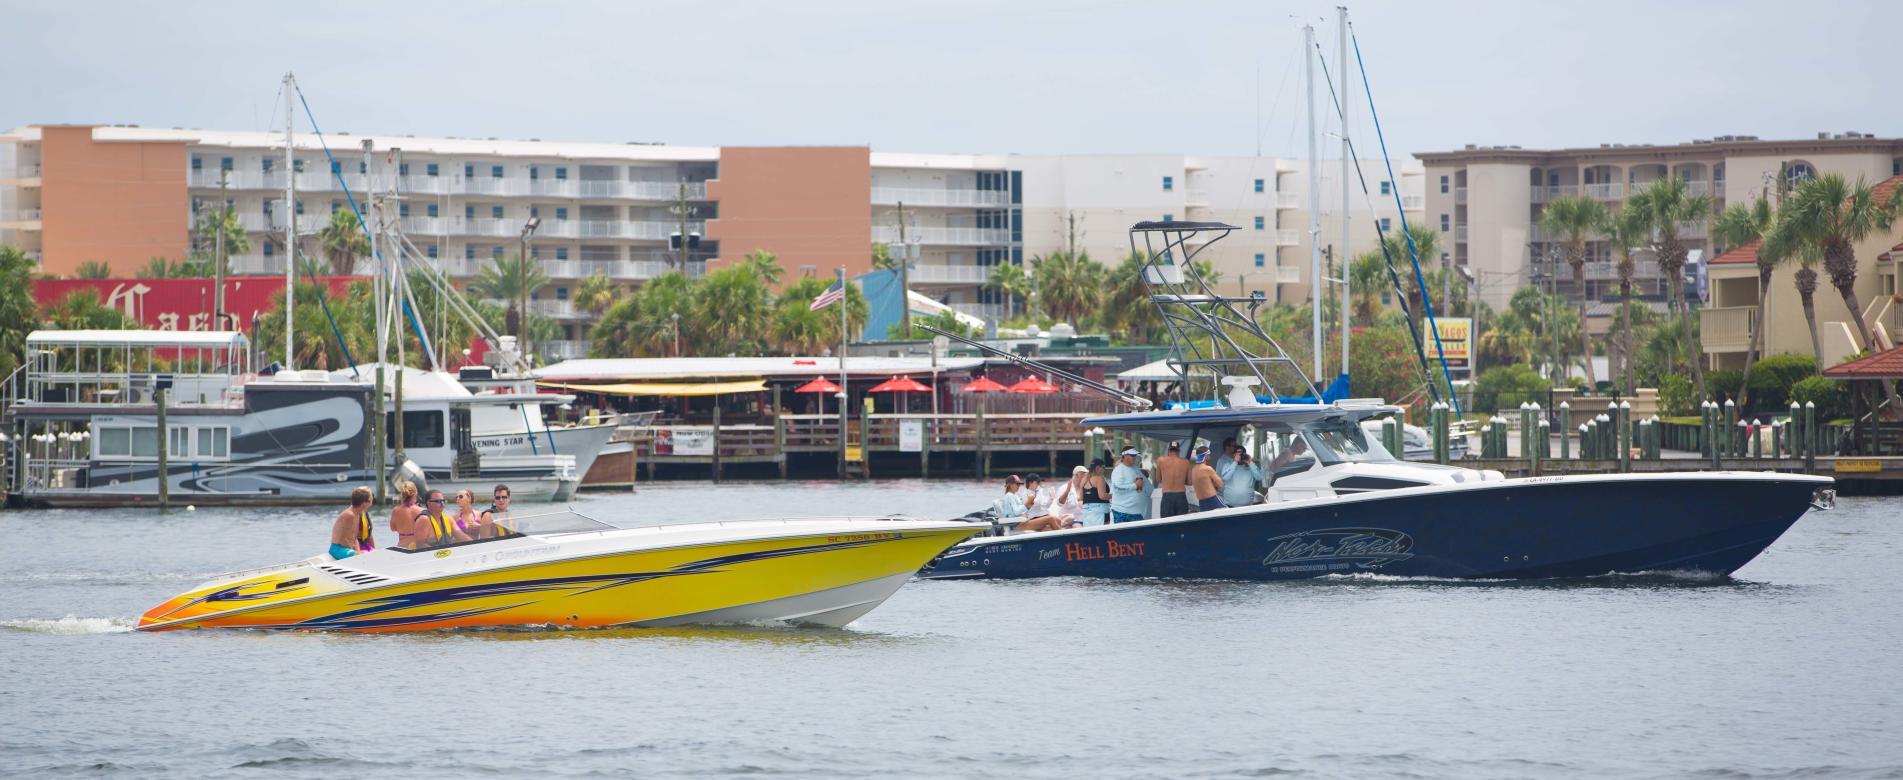 2020 powerboat poker runs